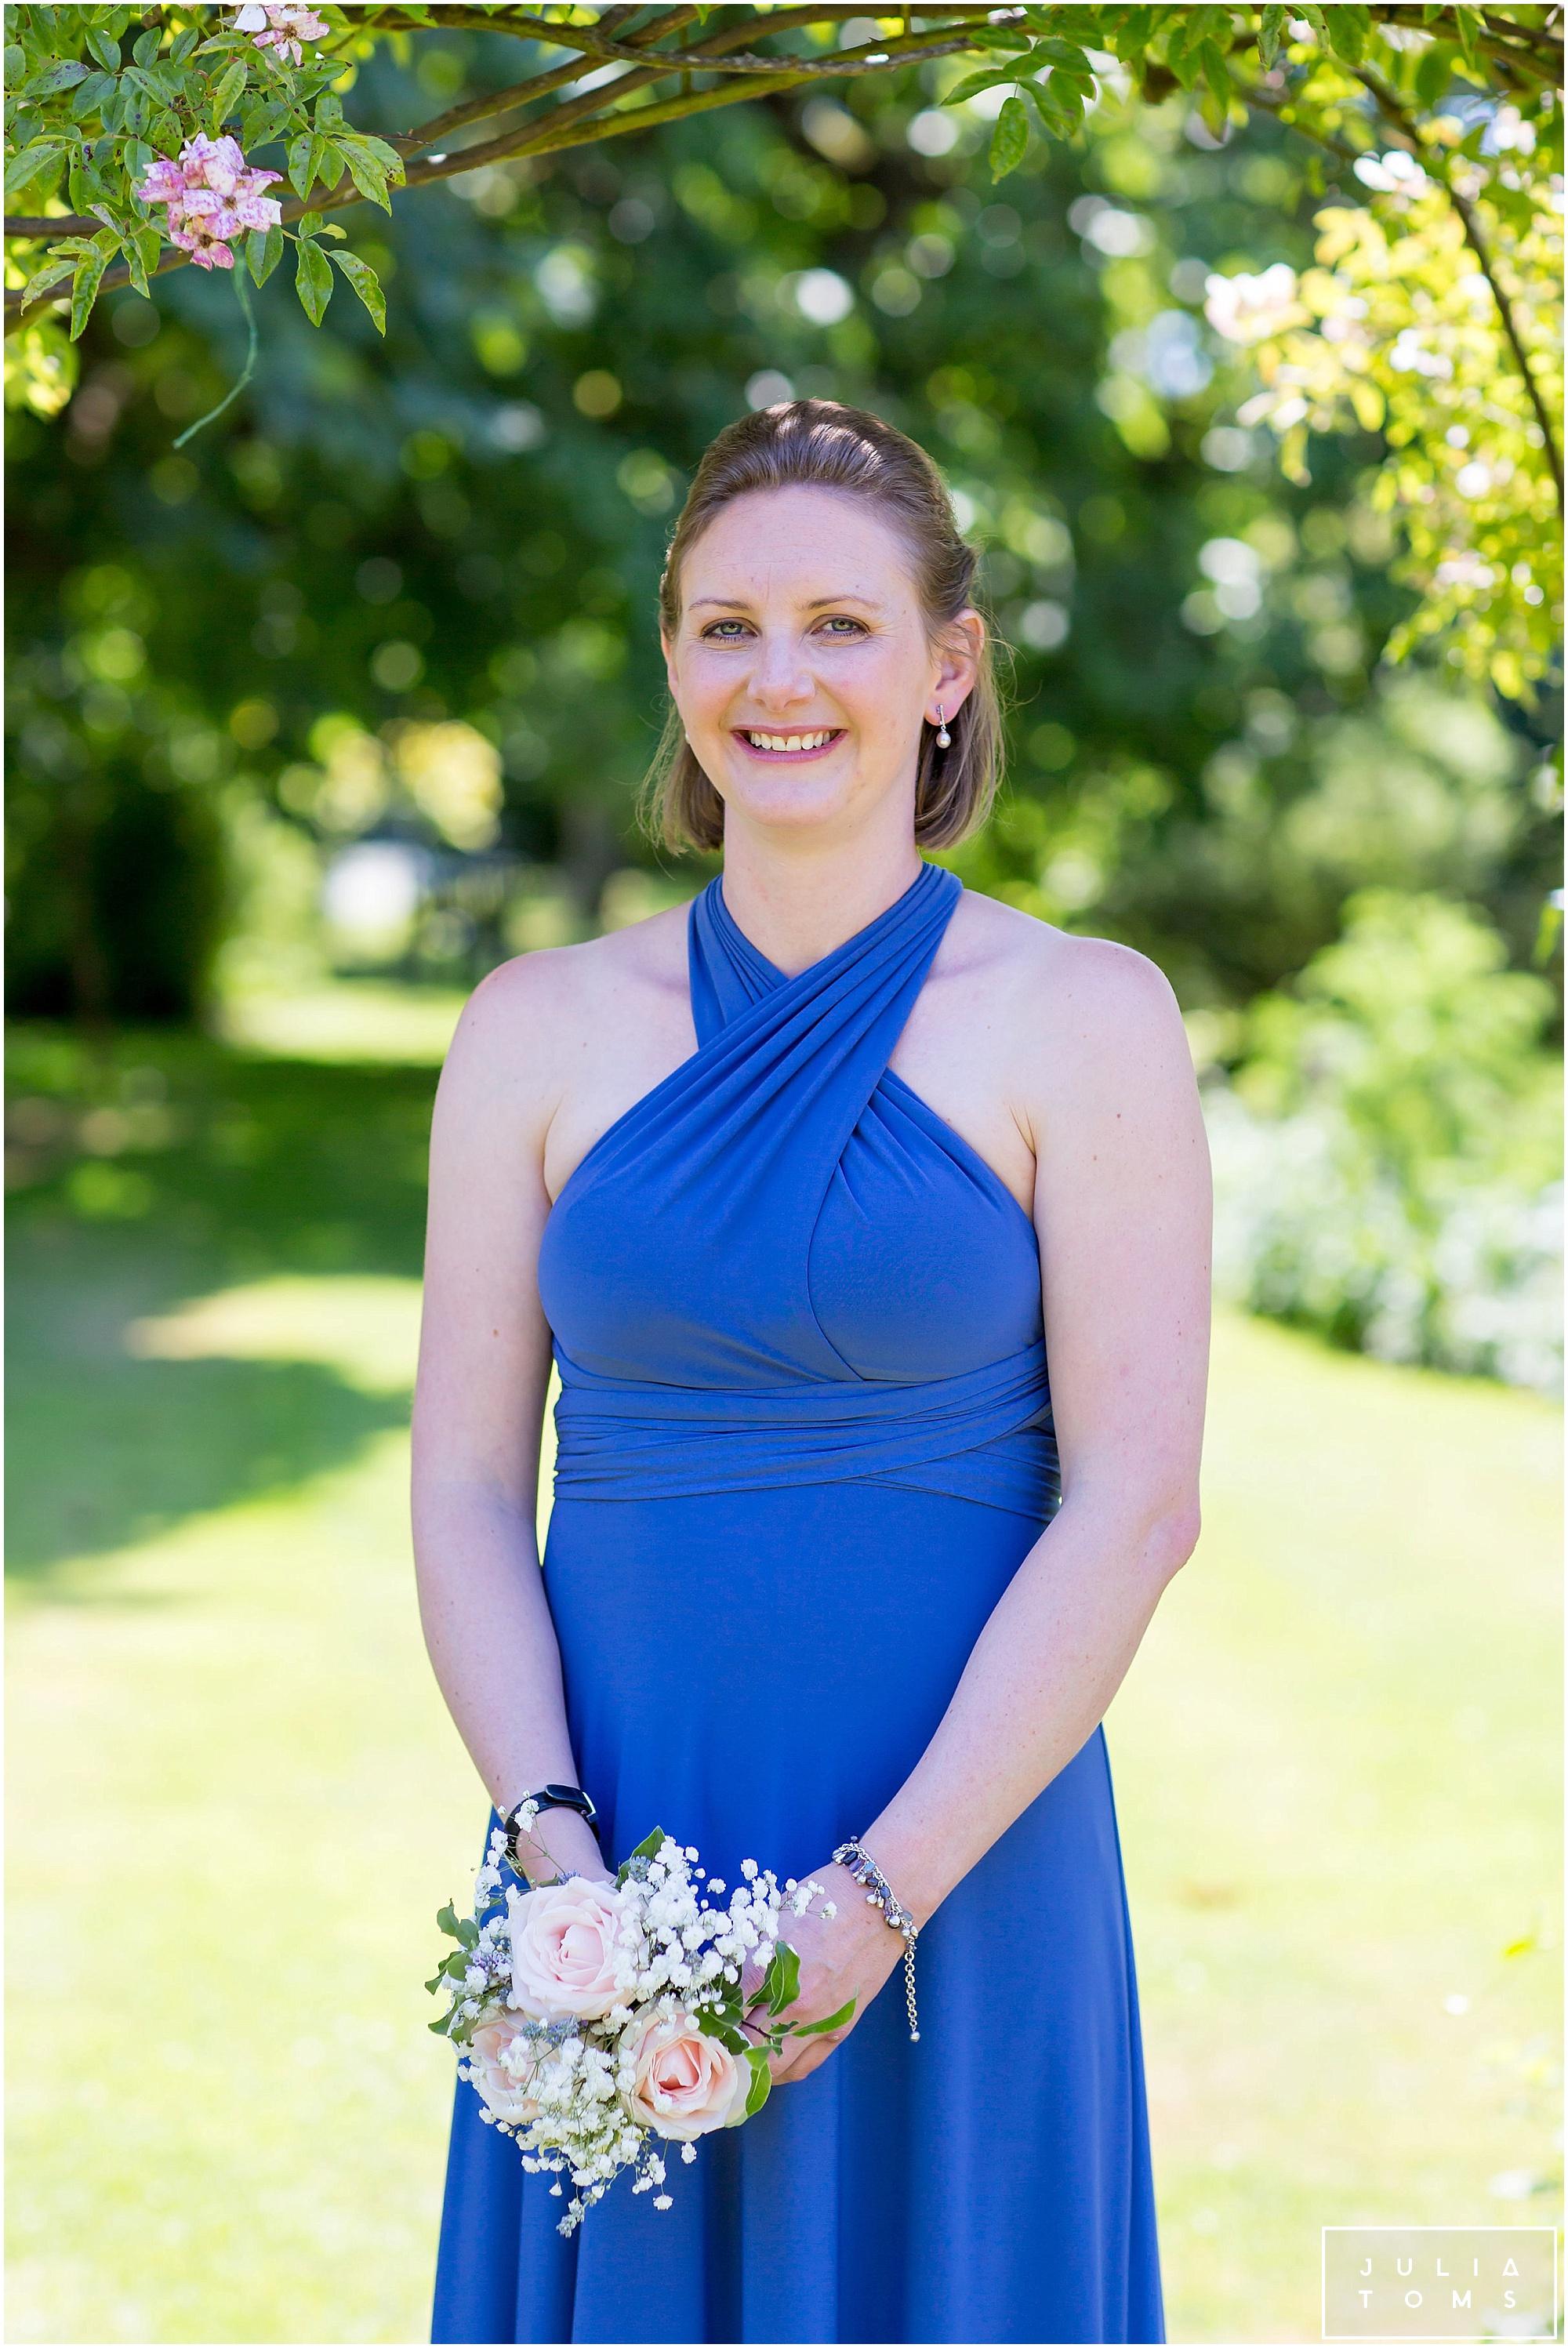 julia_toms_chichester_wedding_photographer_portsmouth_010.jpg